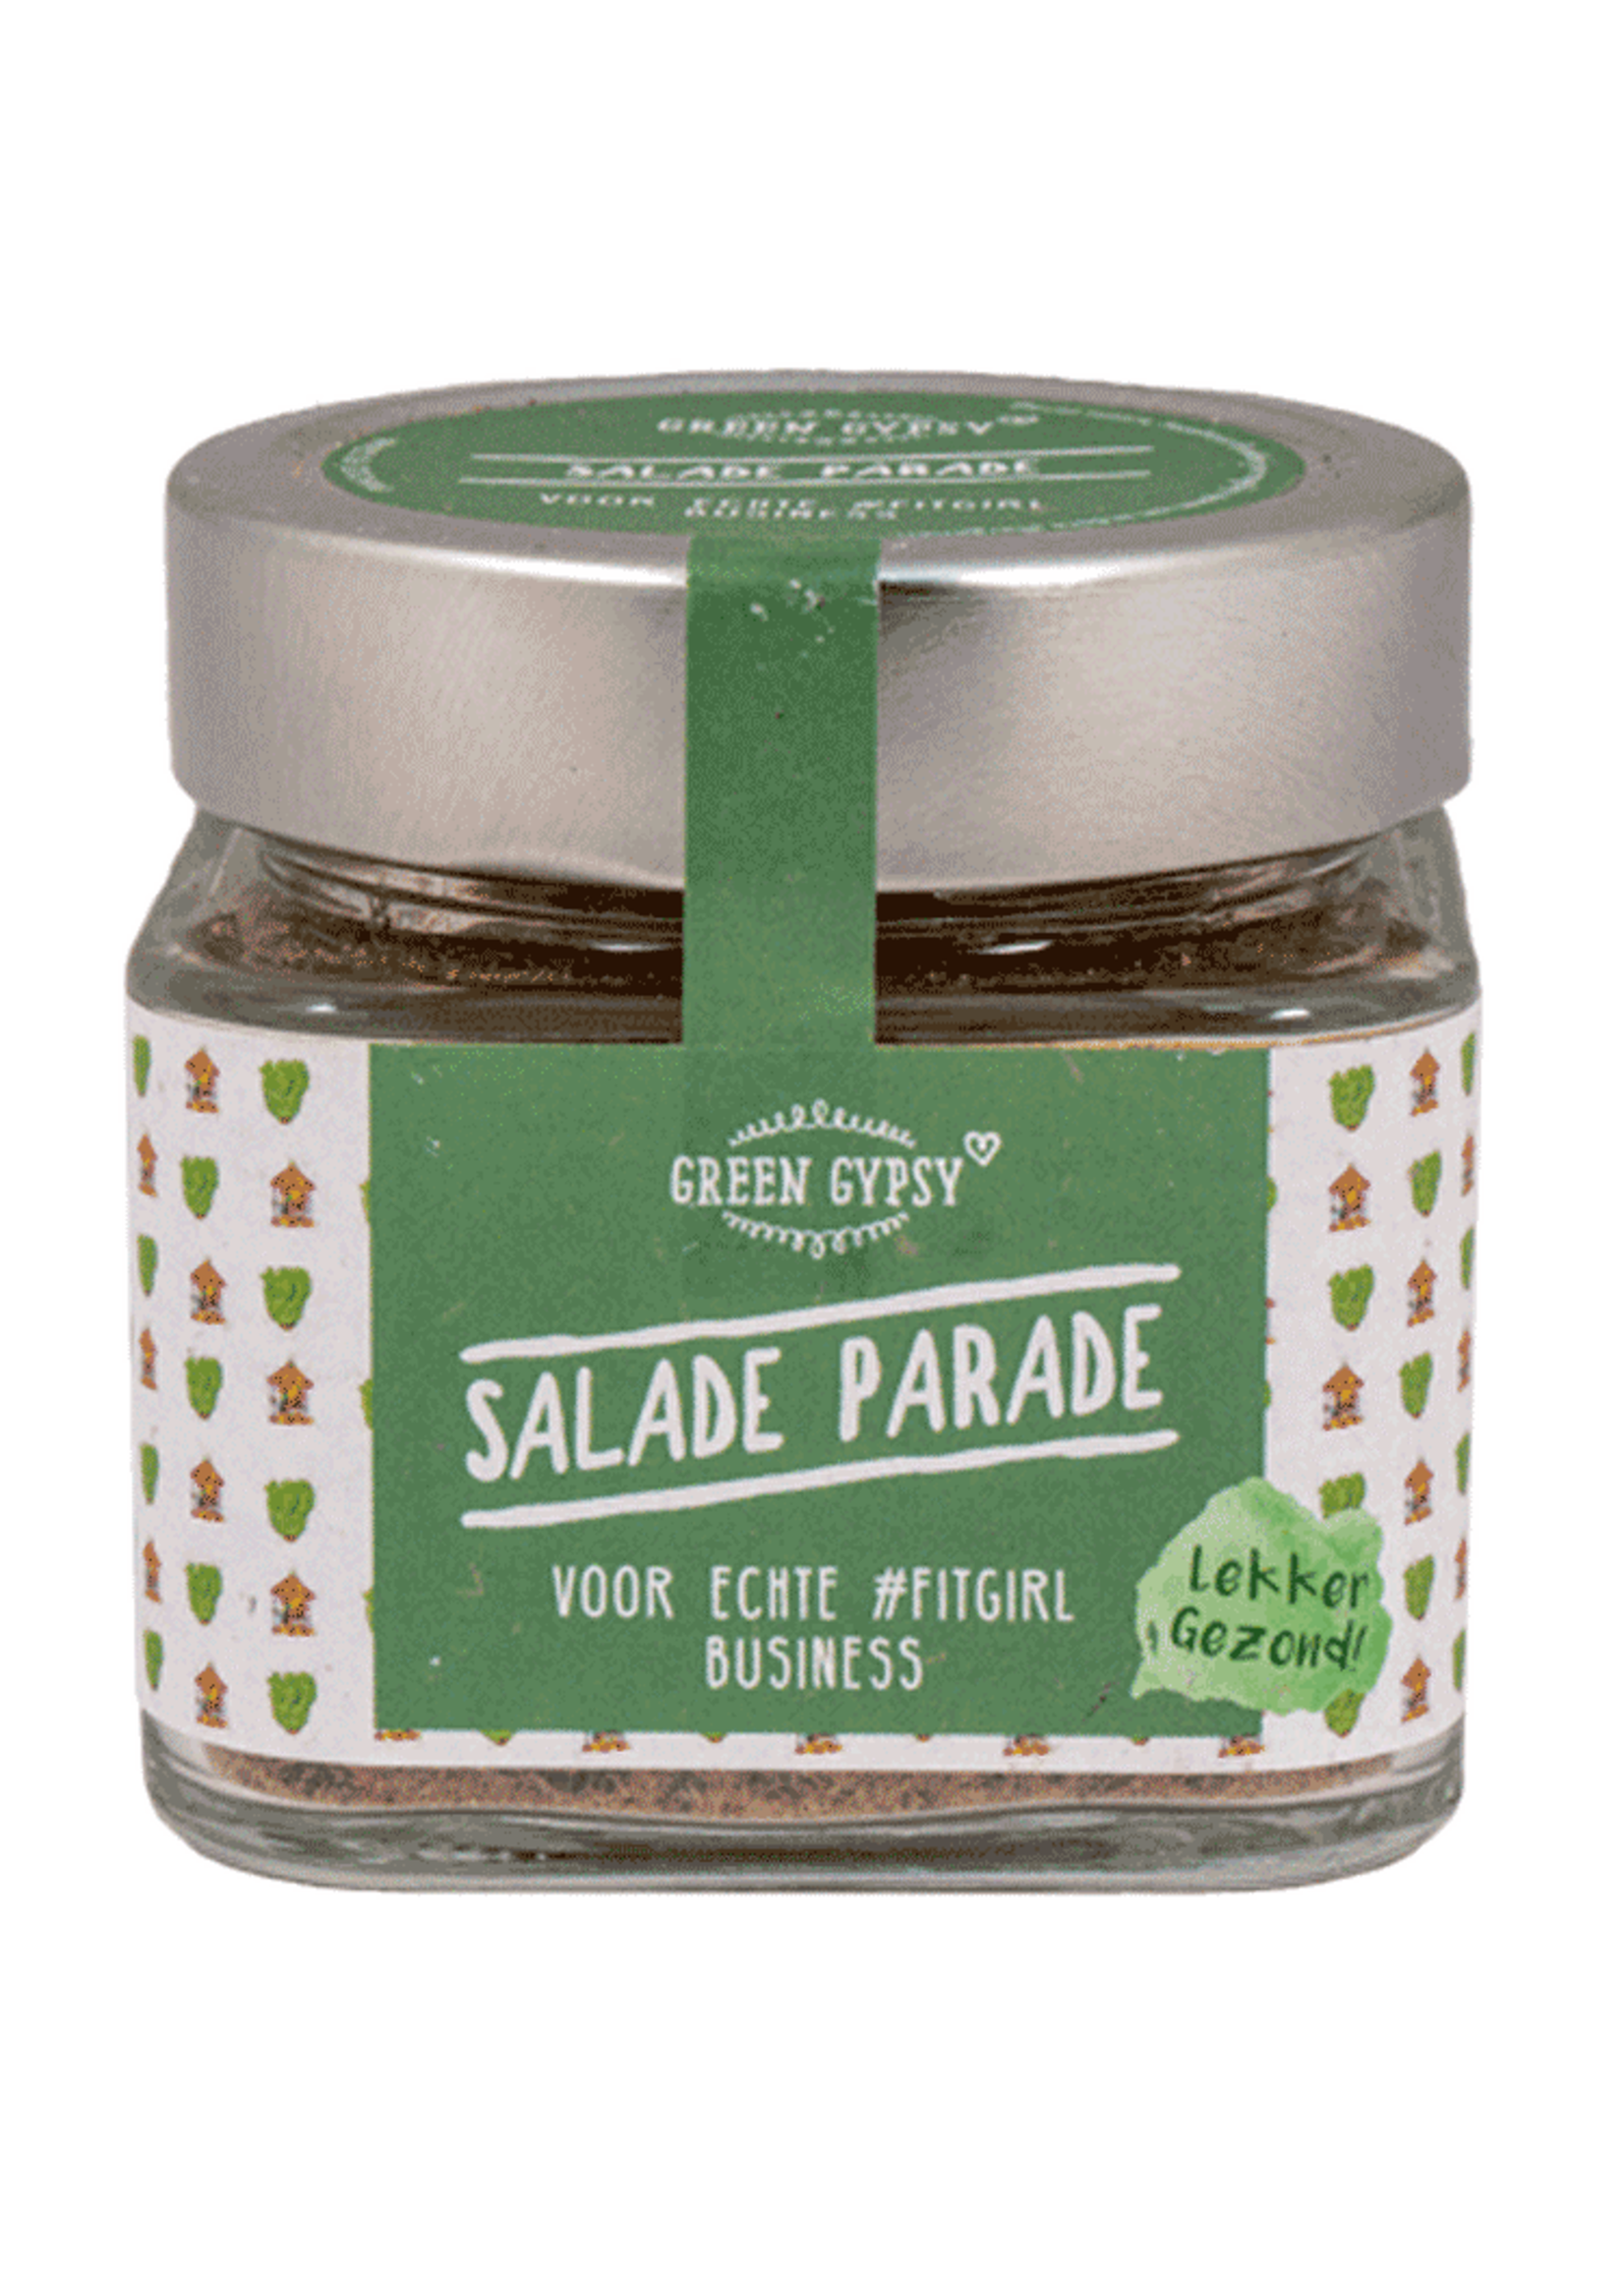 Green Gypsy Spices Kruidenmix Salade Parade Green Gypsy